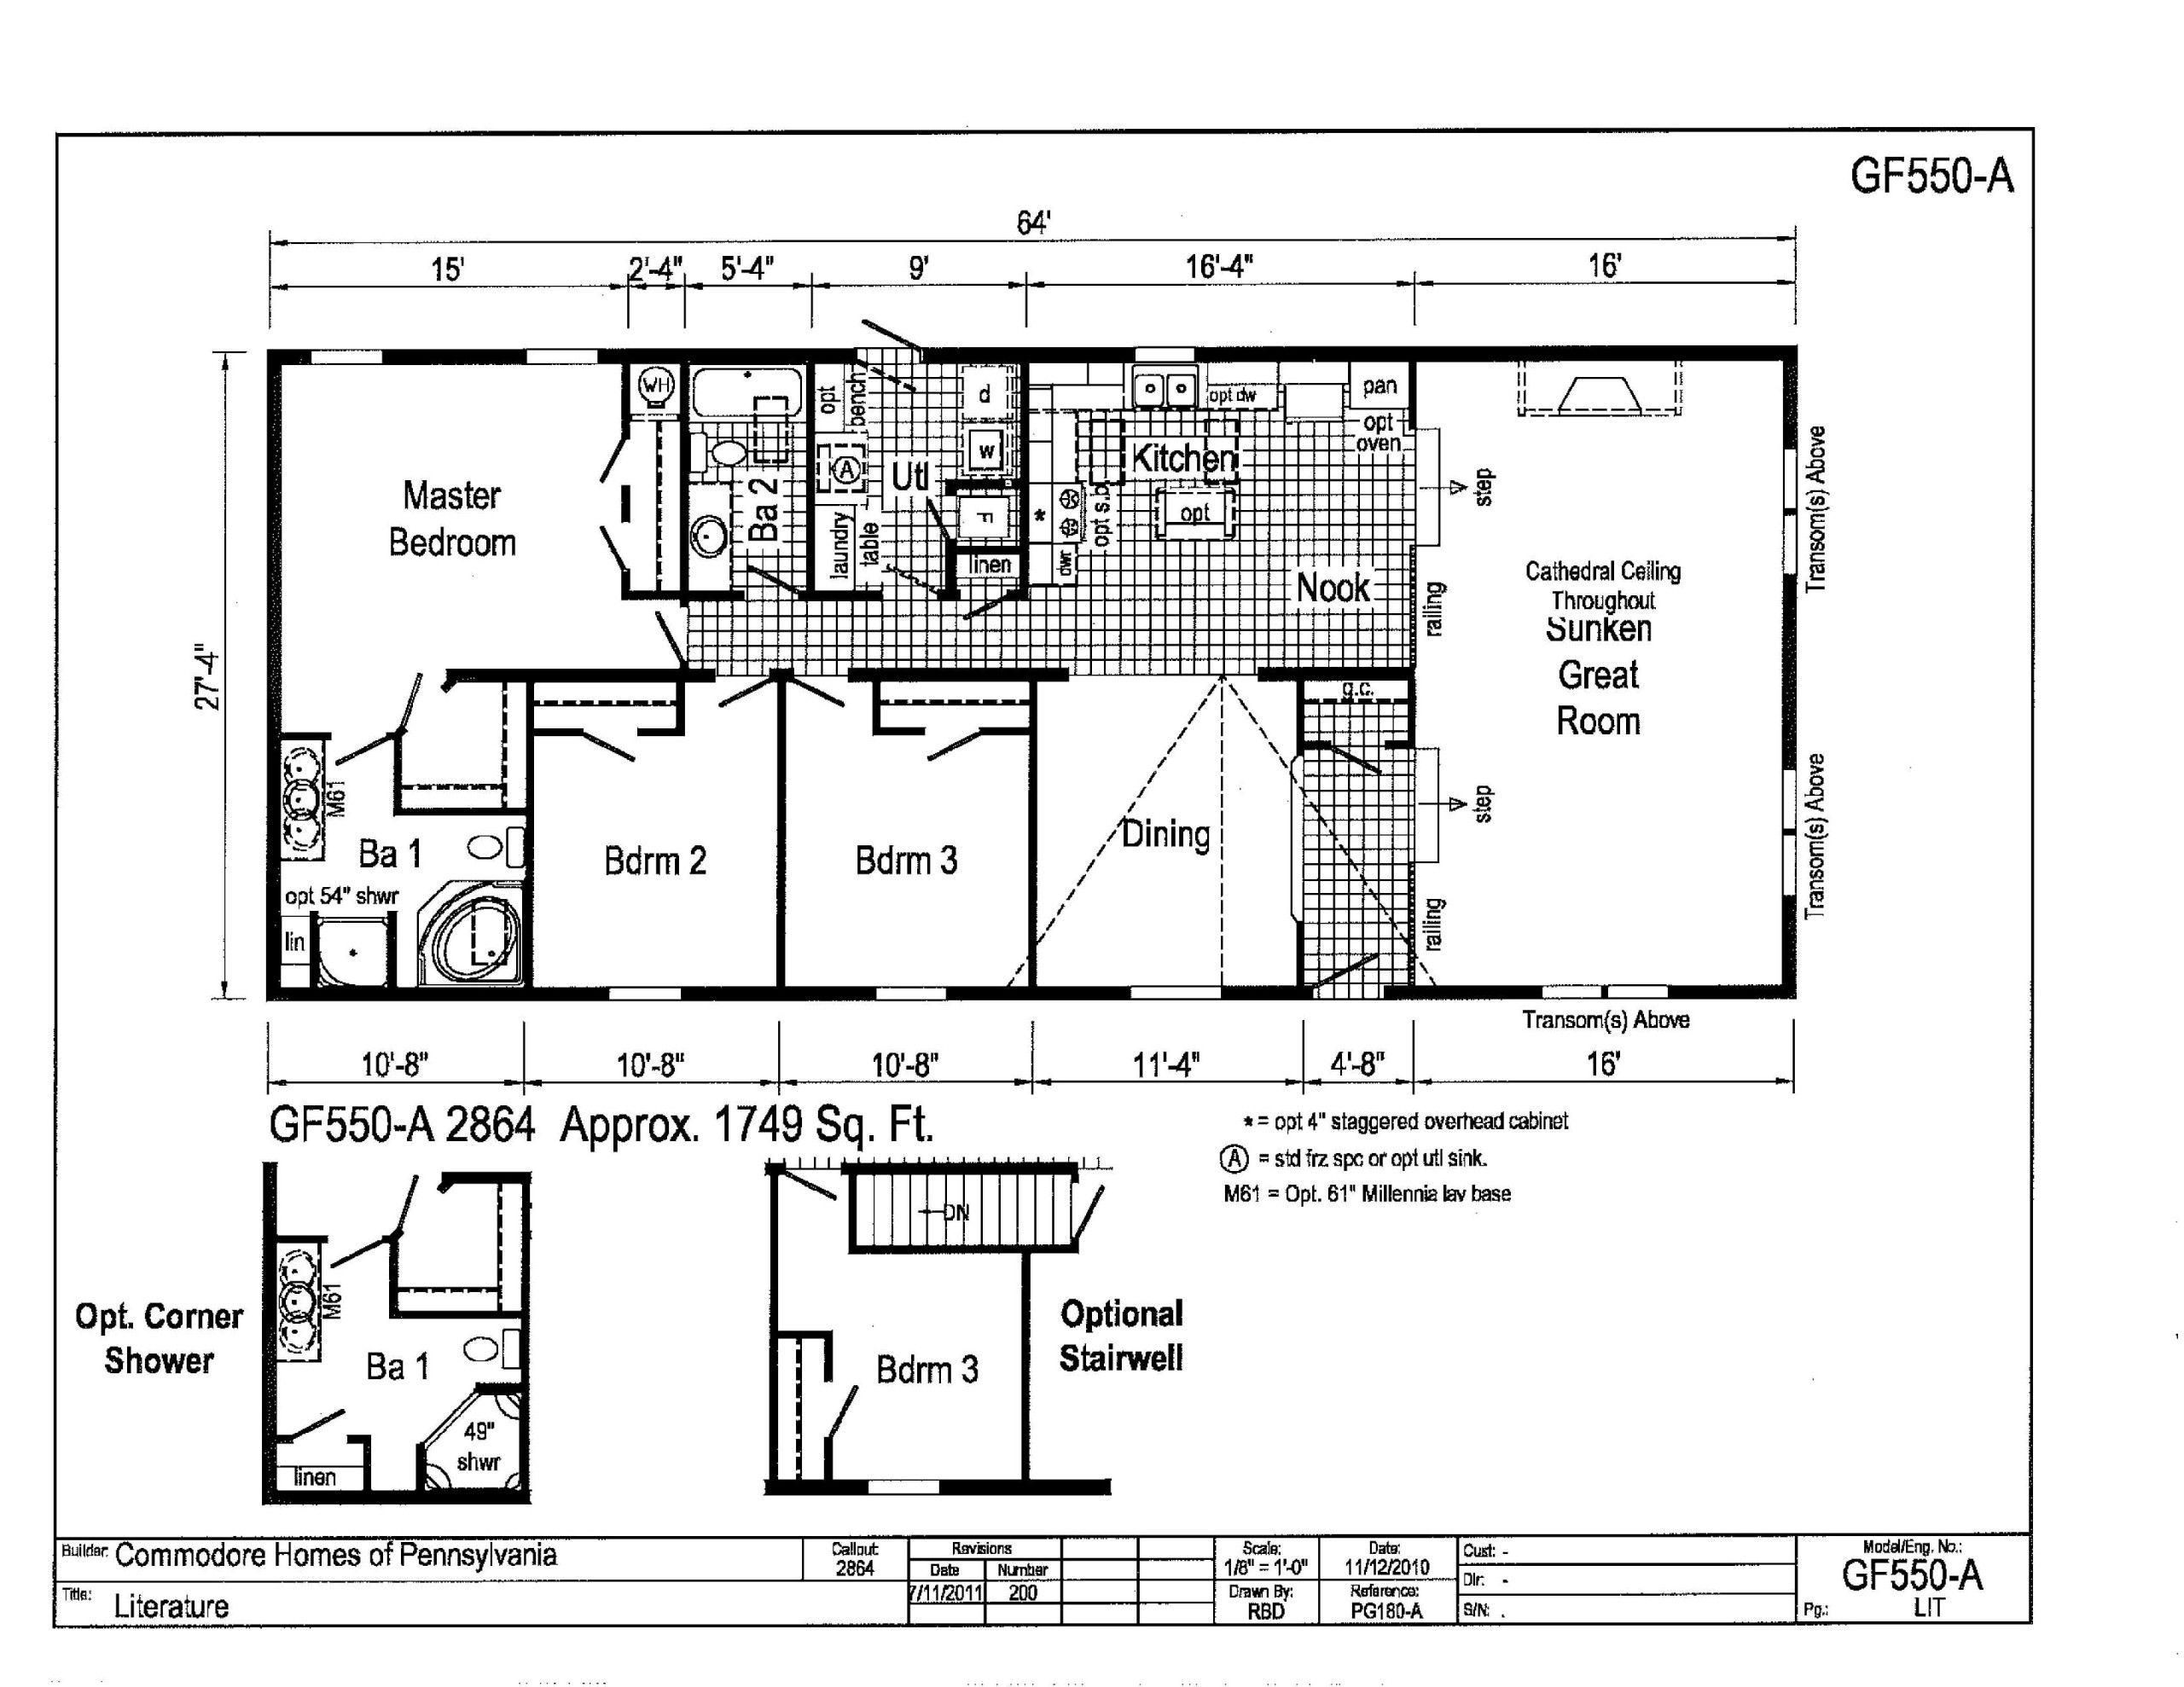 Best room design app for ipad floor plan creator interior android best room design app for ipad floor plan creator interior android apps google play malvernweather Image collections